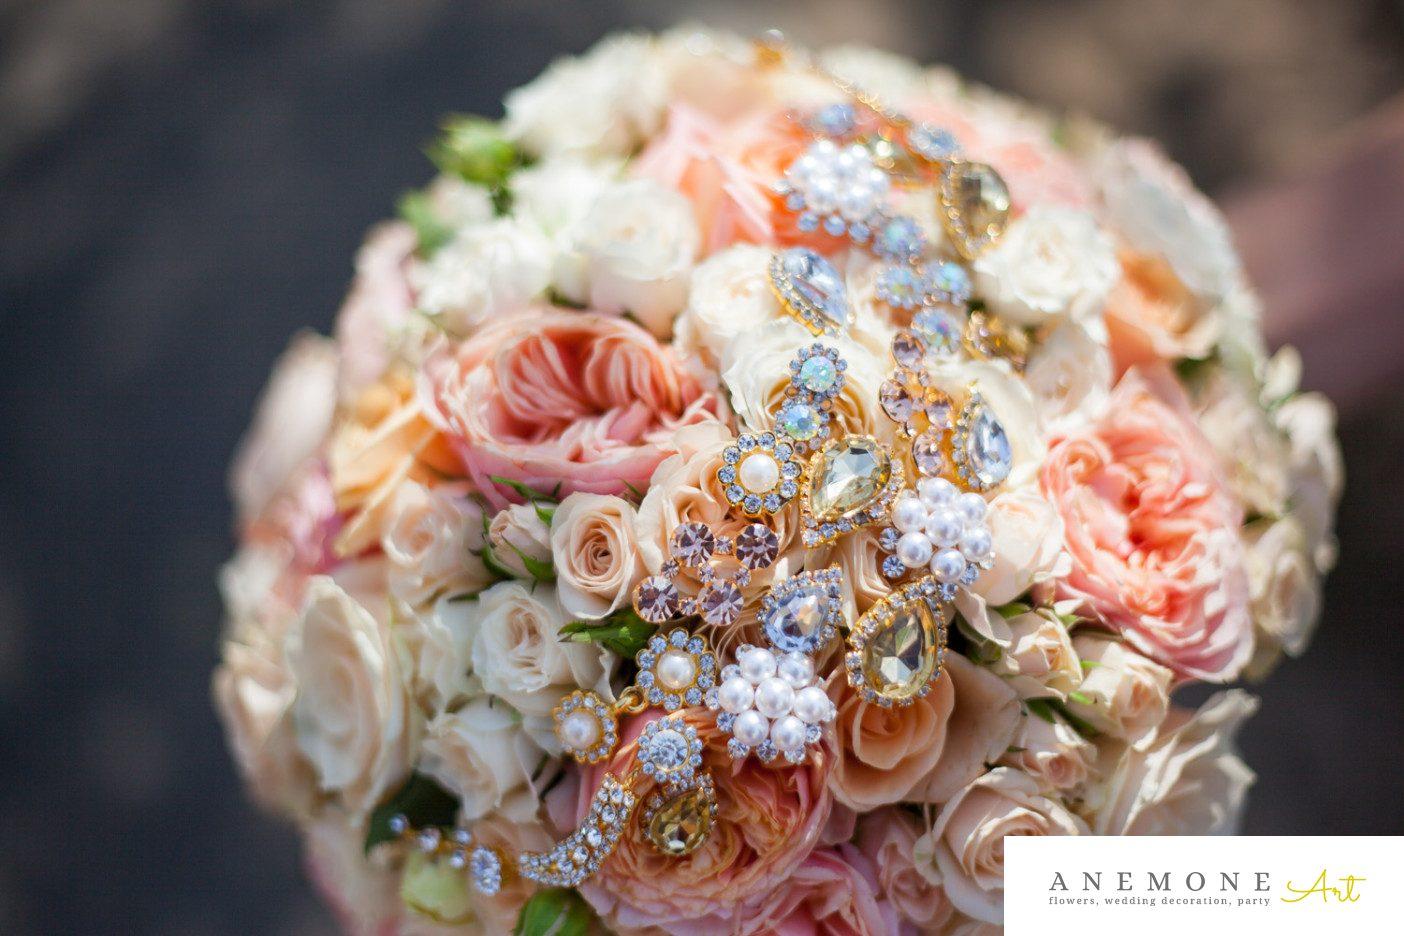 Poza, foto cu Flori de nunta buchet mireasa, crem, cristale, piersica, rotund in Arad, Timisoara, Oradea (wedding flowers, bouquets) nunta Arad, Timisoara, Oradea